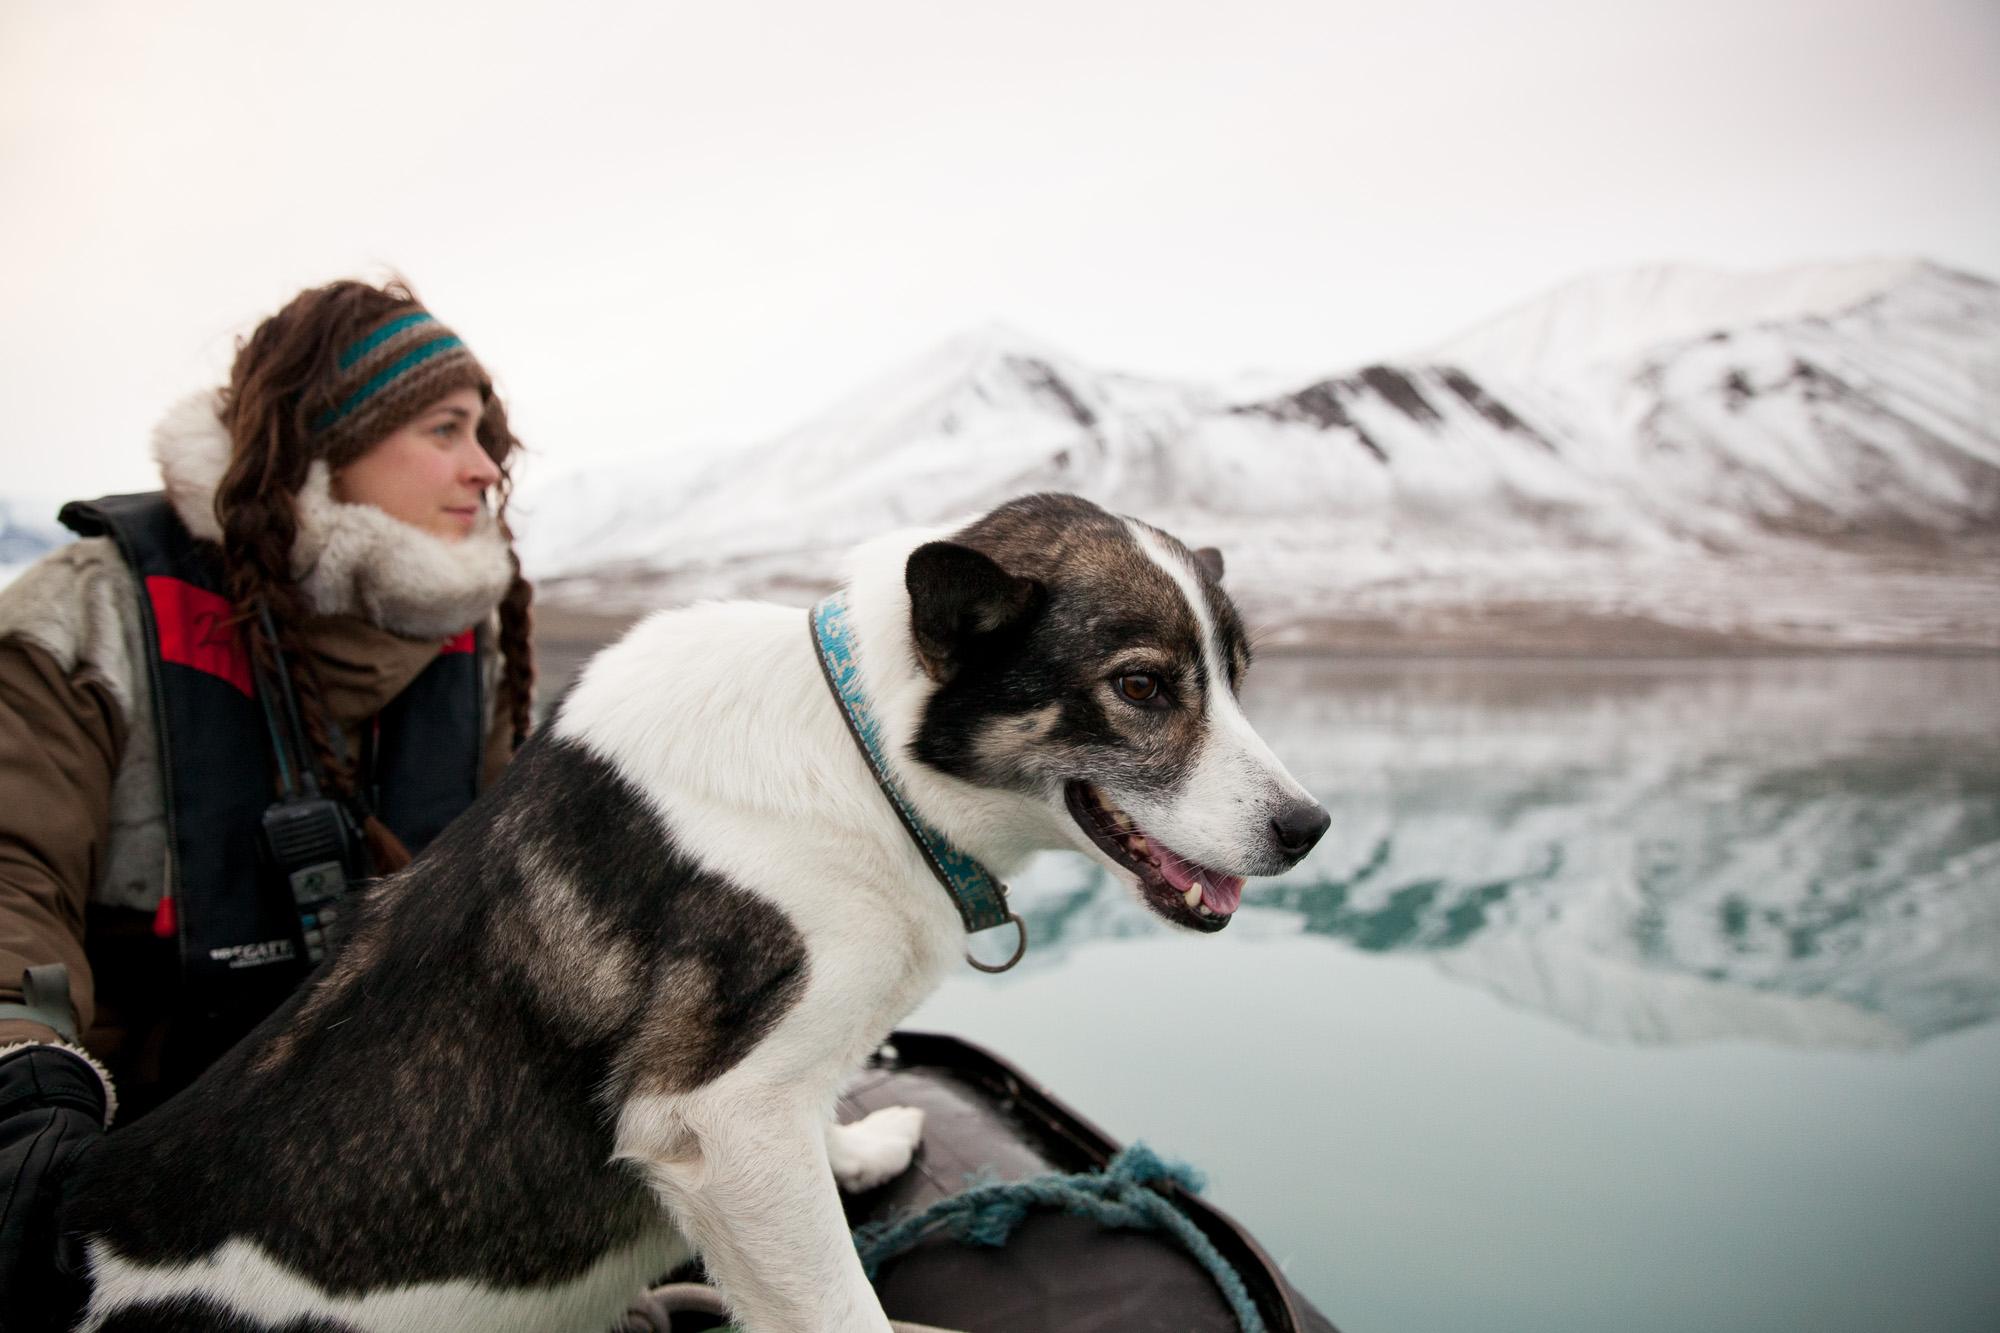 arctic-svalbard-3054.jpg